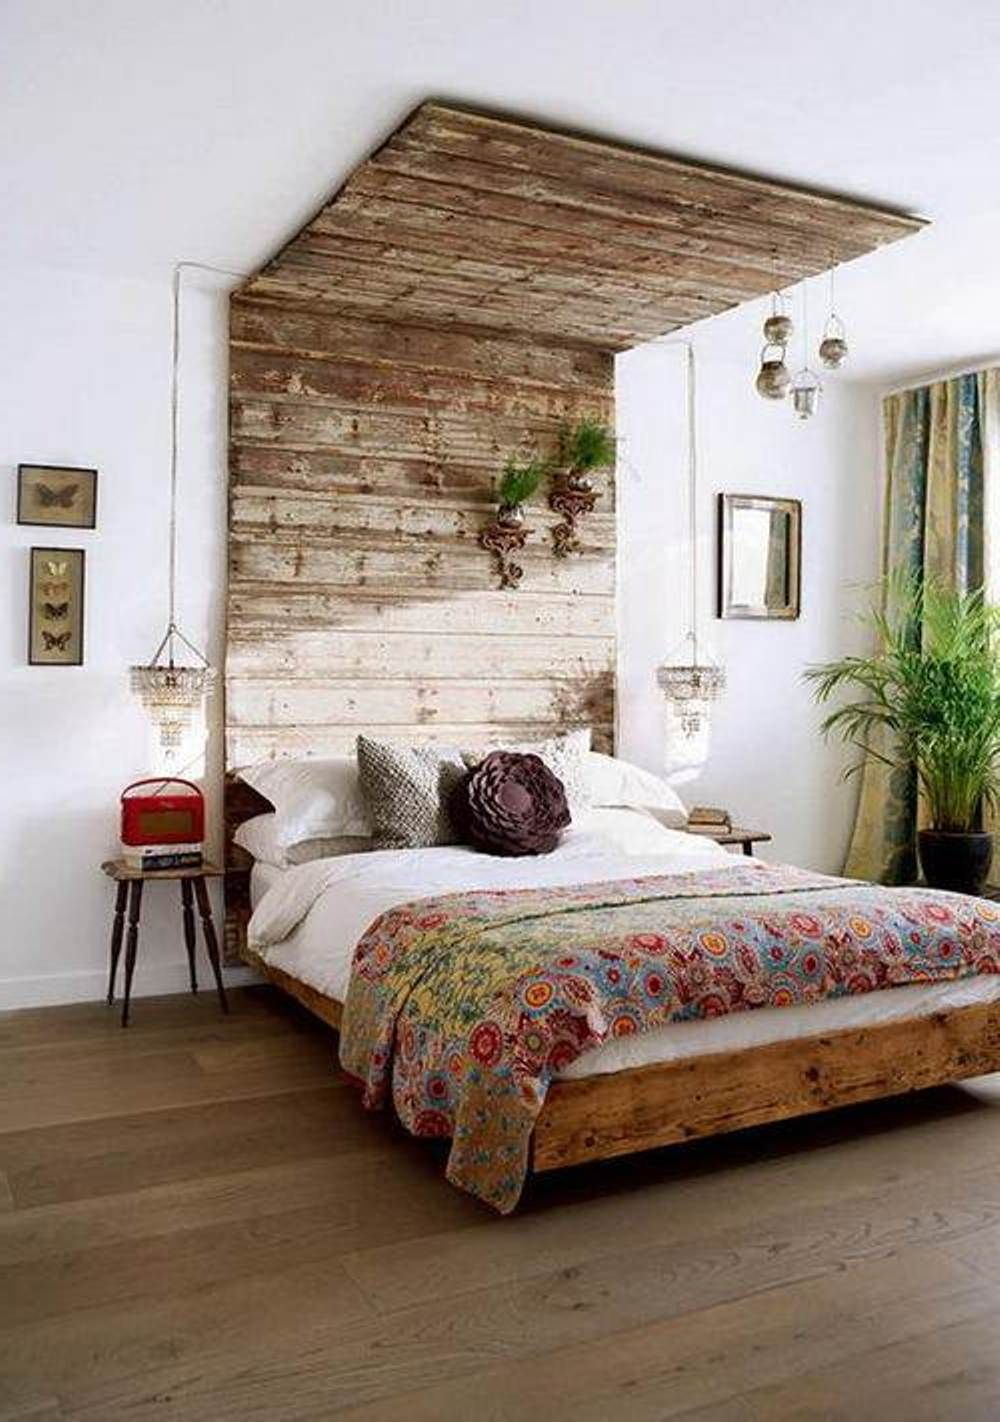 Boho Bedroom Stylish Boho Chic Bedroom Home Pinterest